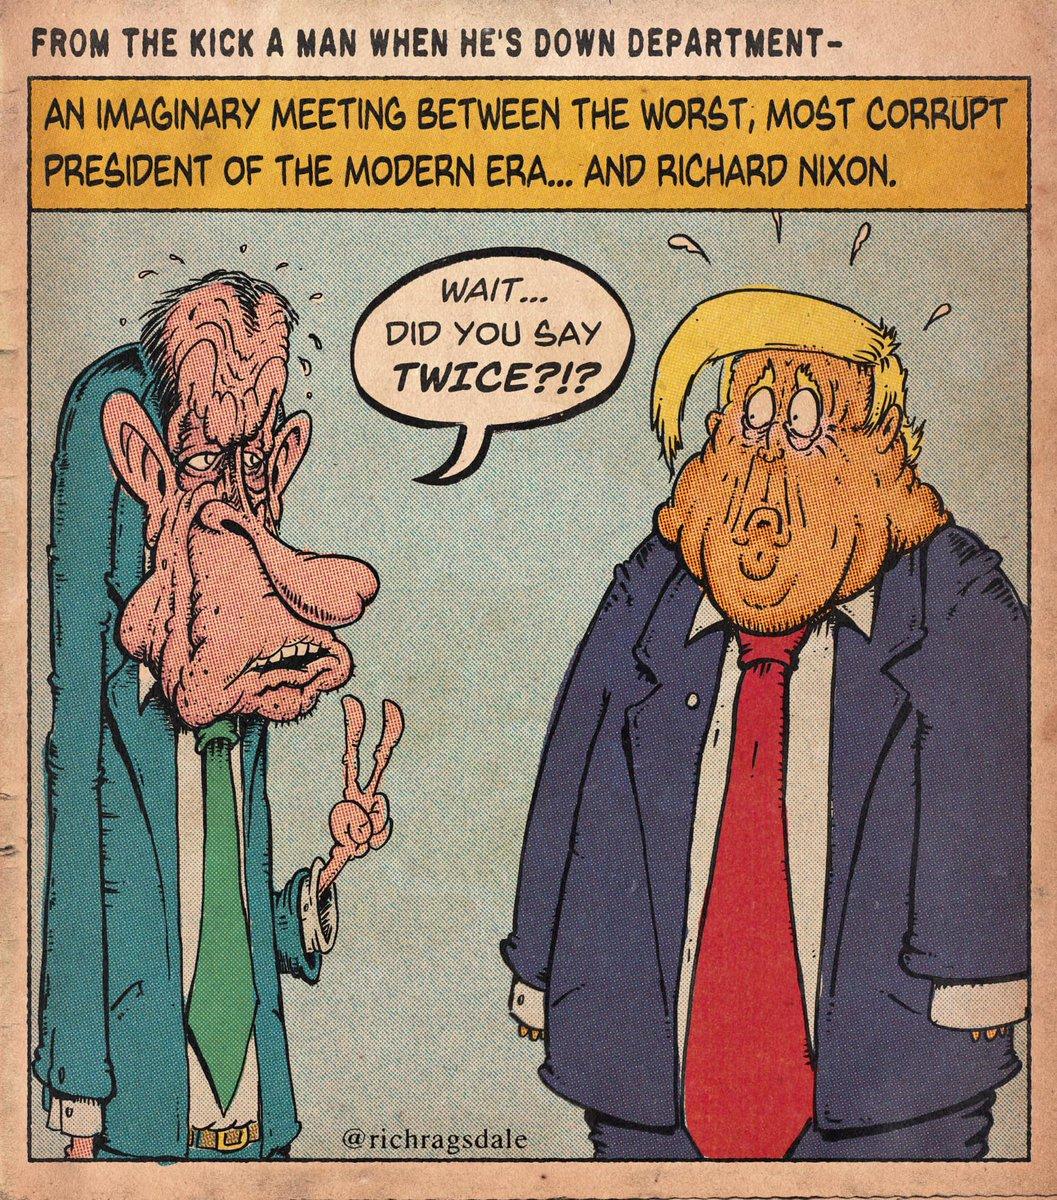 #ConvictTrump #ConvictAndDisqualifyTrump #GOPCorruptionOverCountry #TrumpFailedAmerica